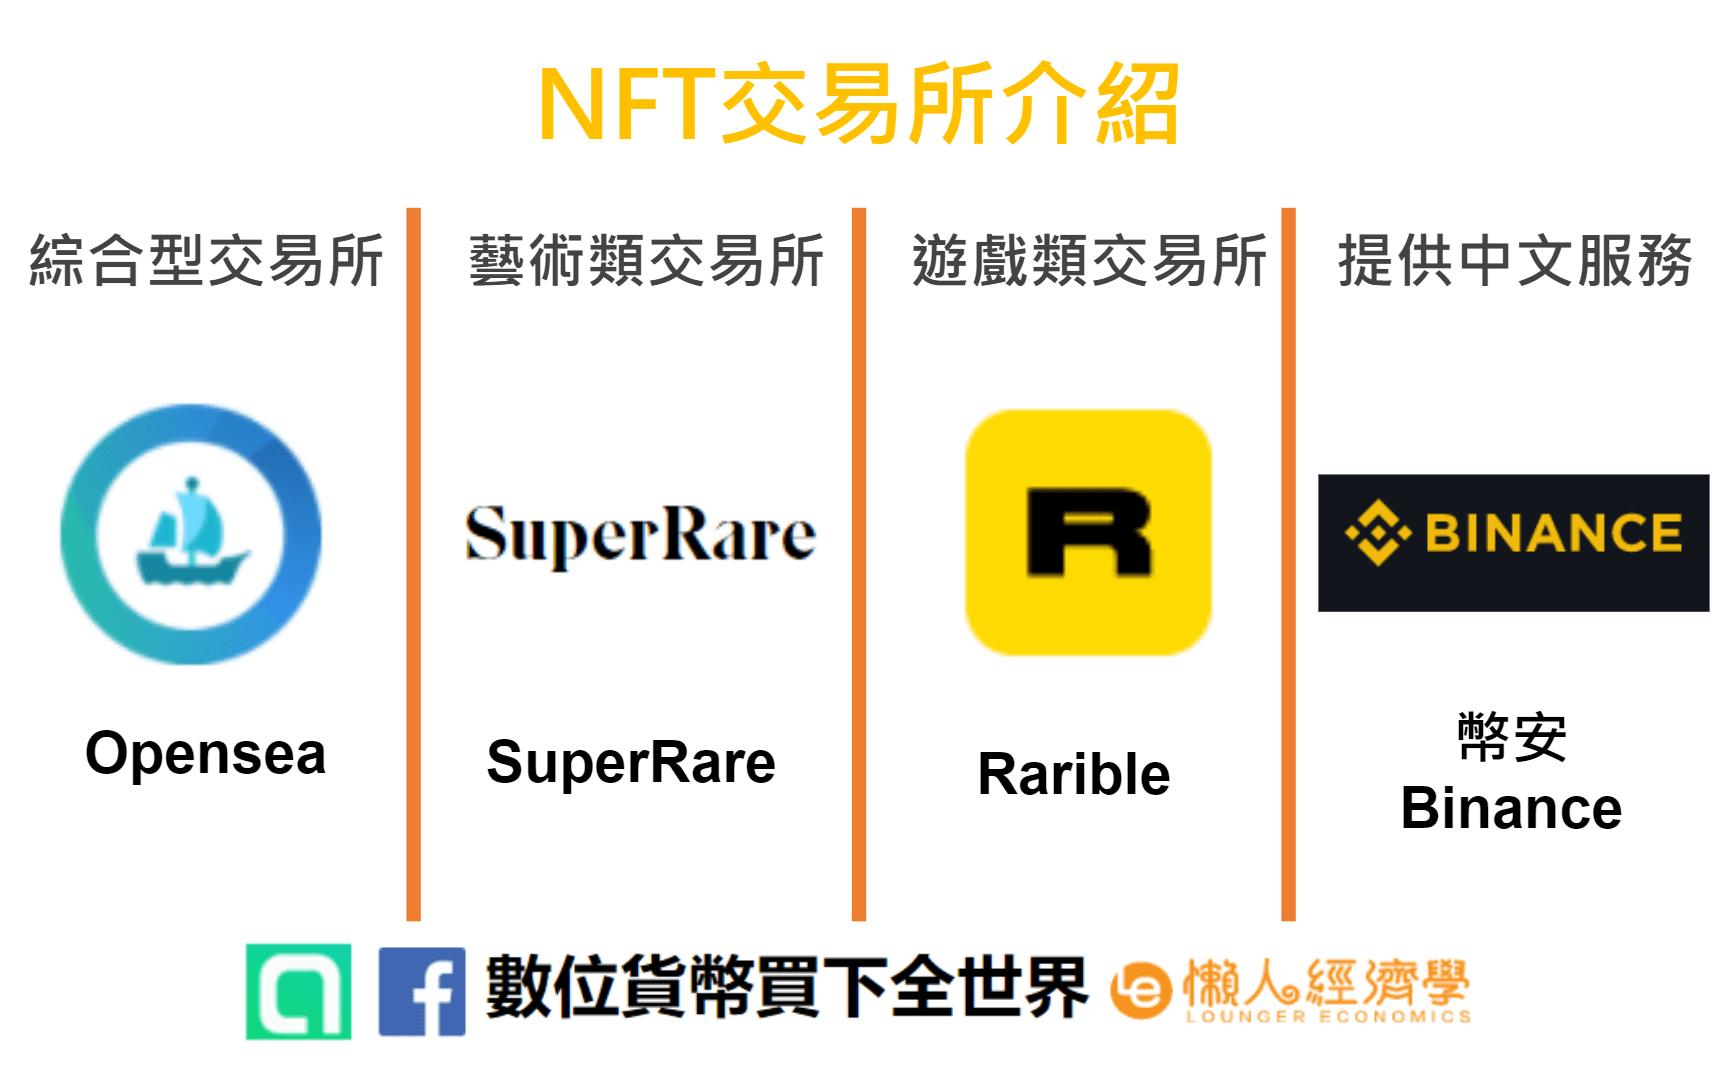 NFT交易所介紹:綜合型交易所Opensea、藝術類SuperRare、遊戲類Rarible、提供中文服務的交易所幣安Binance